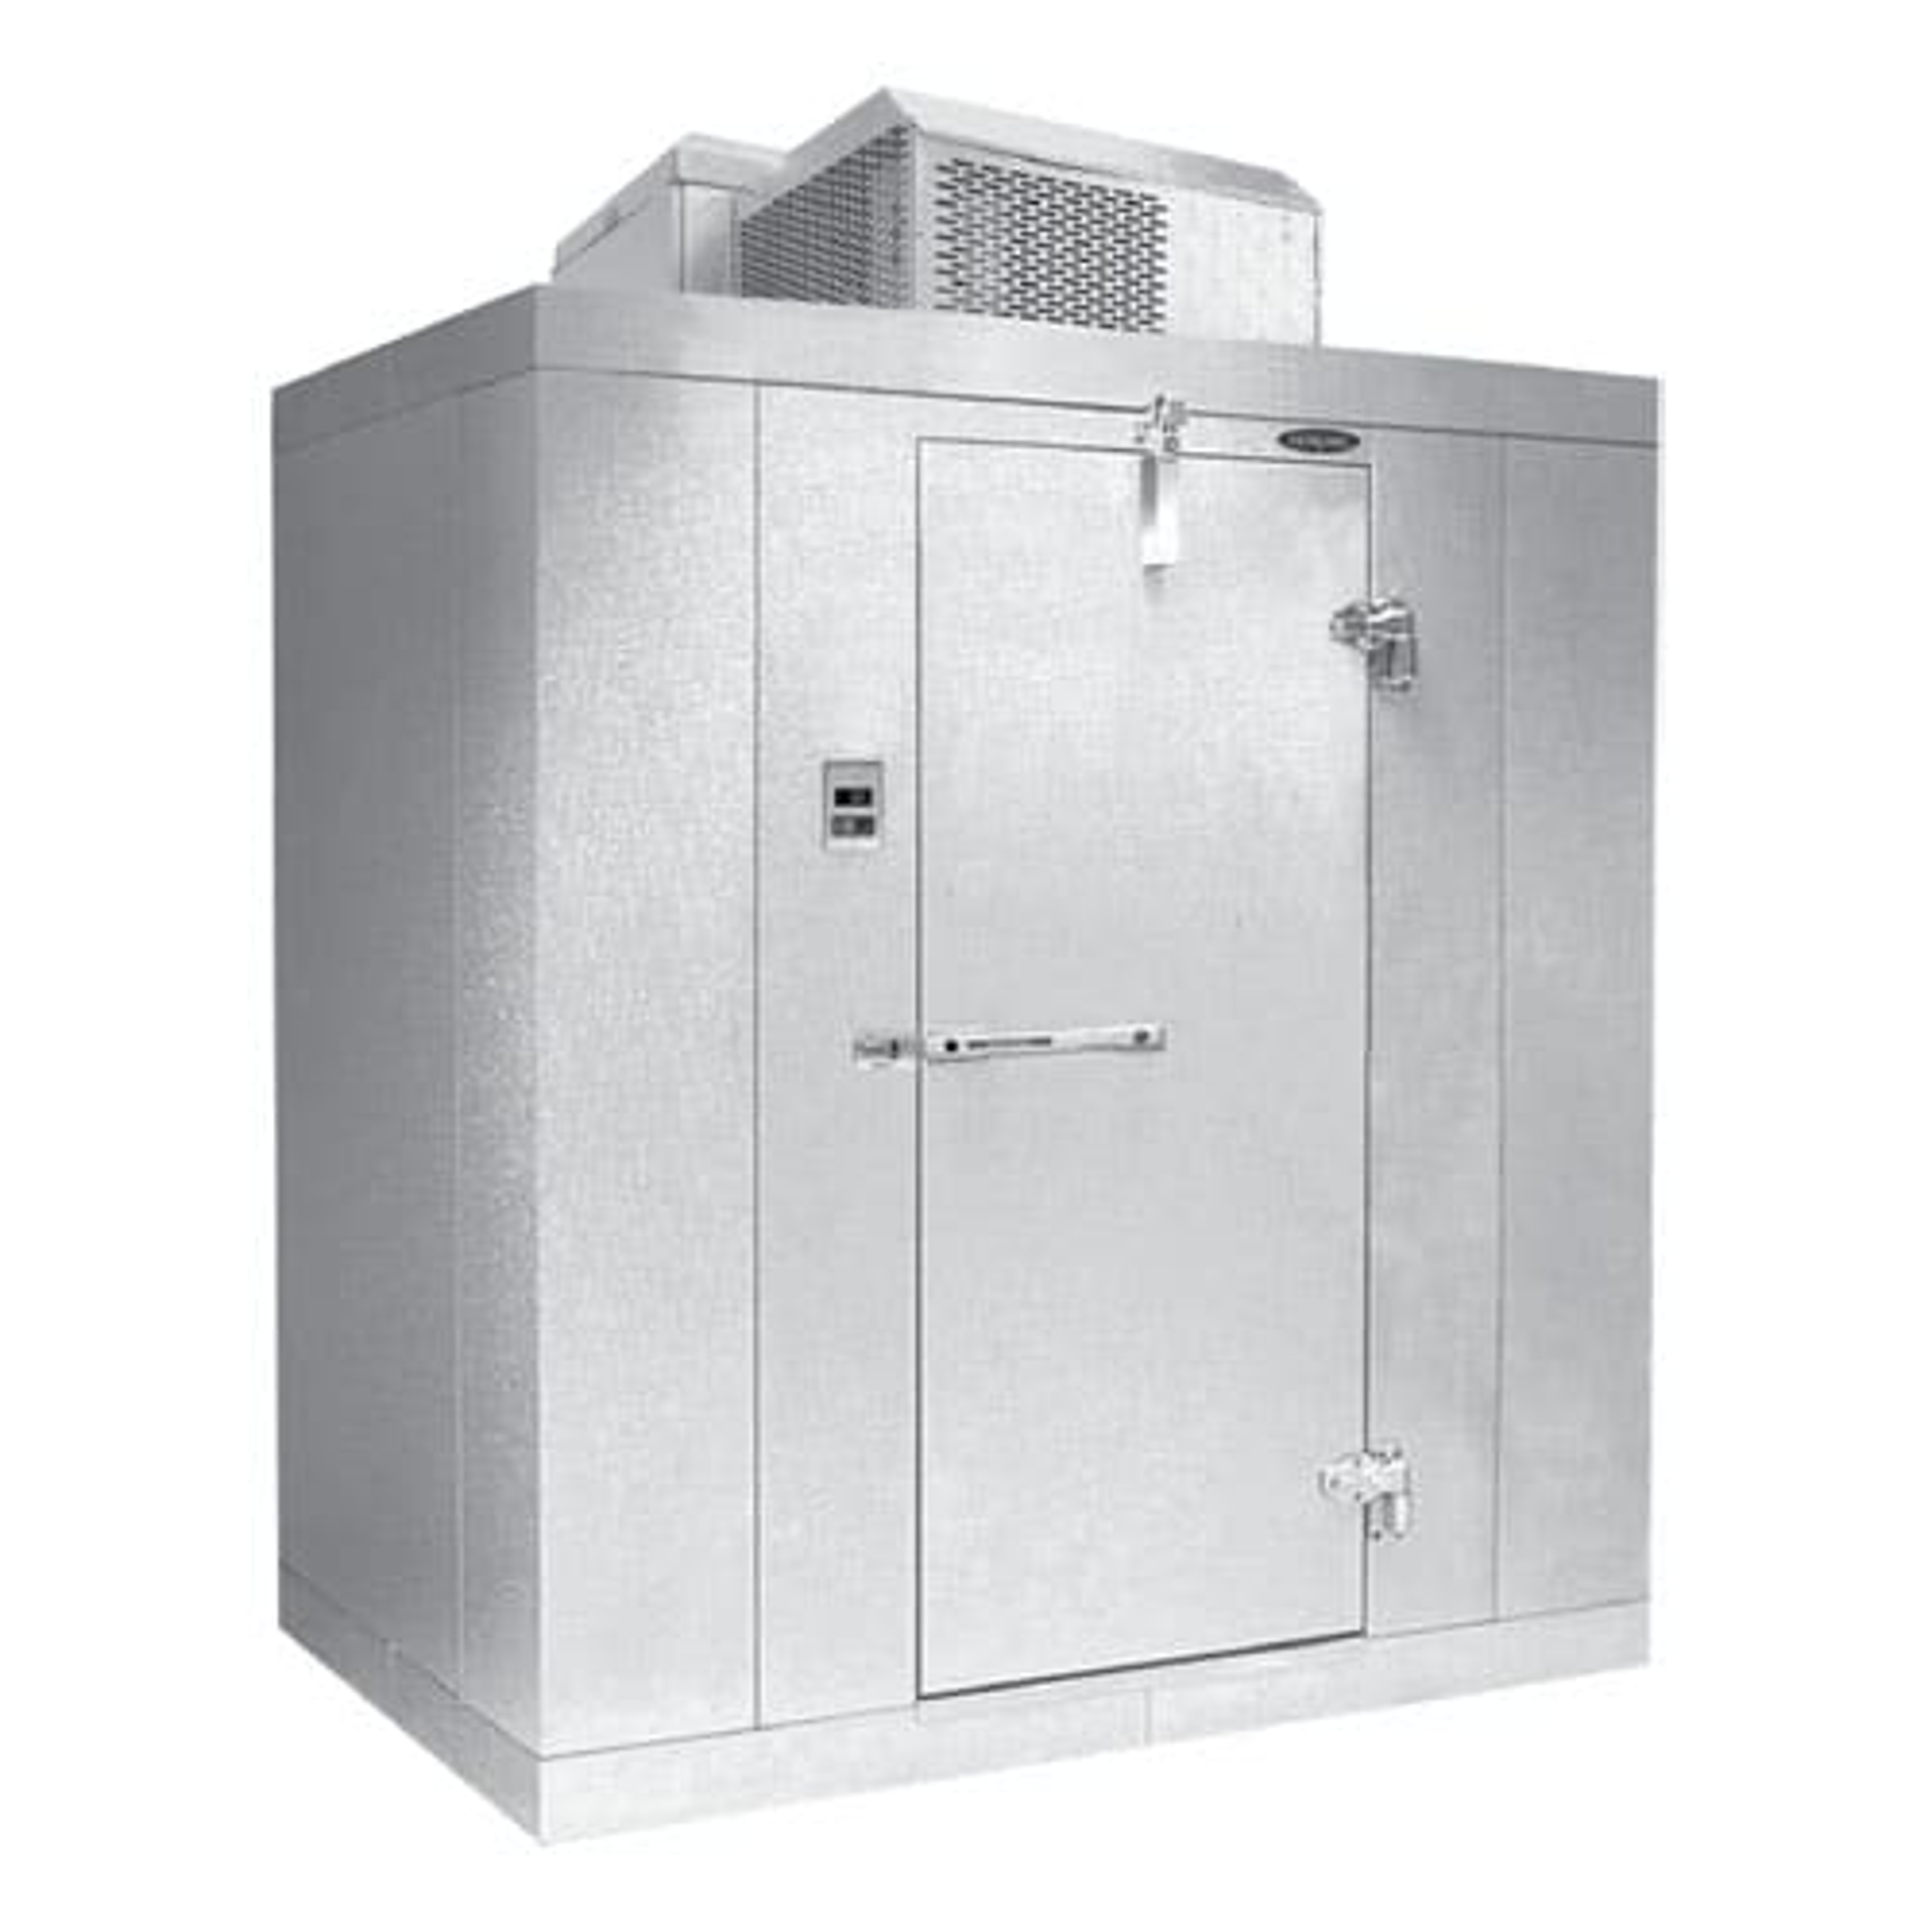 Nor-Lake KLB7468-C L Indoor Walk-In Refrigerator w/ Top M...